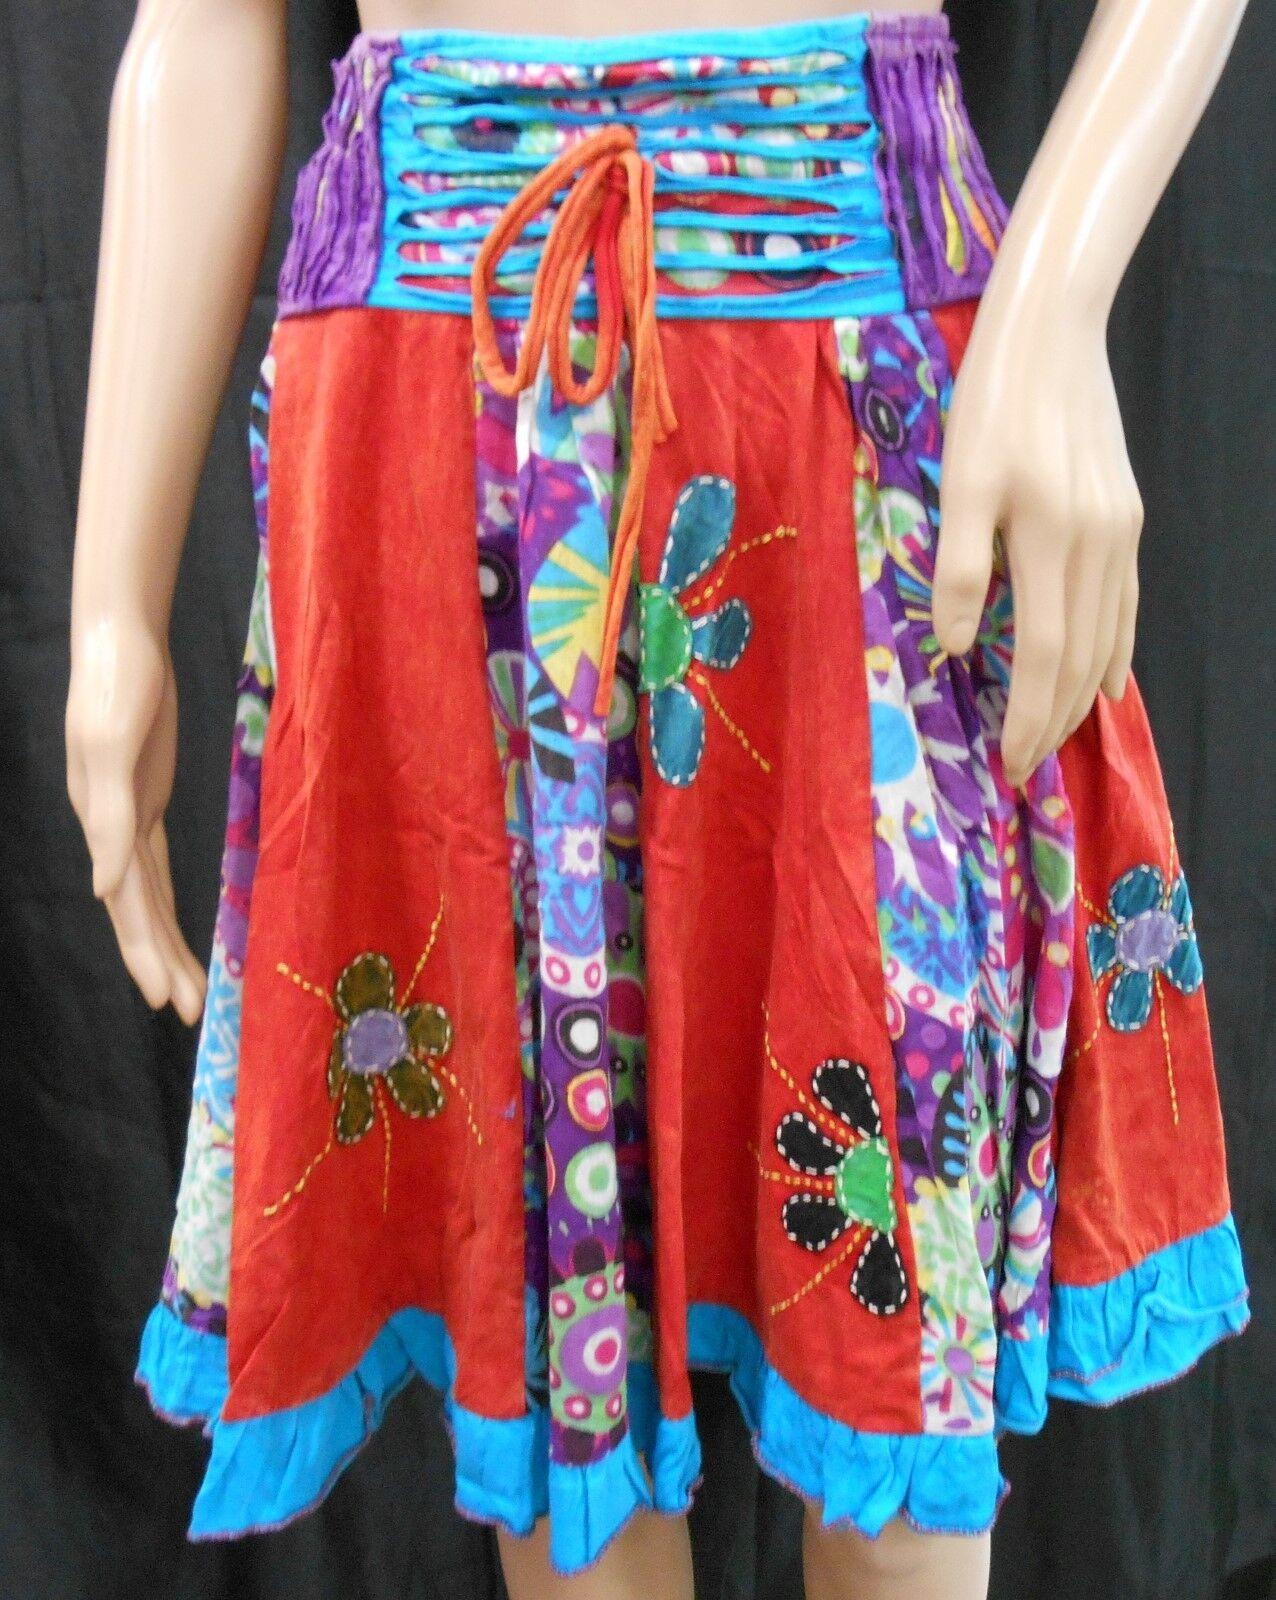 RISING INTERNATIONAL NEPAL Handmade SKIRT Multi-color Patchwork FLOWER APPLIQUE